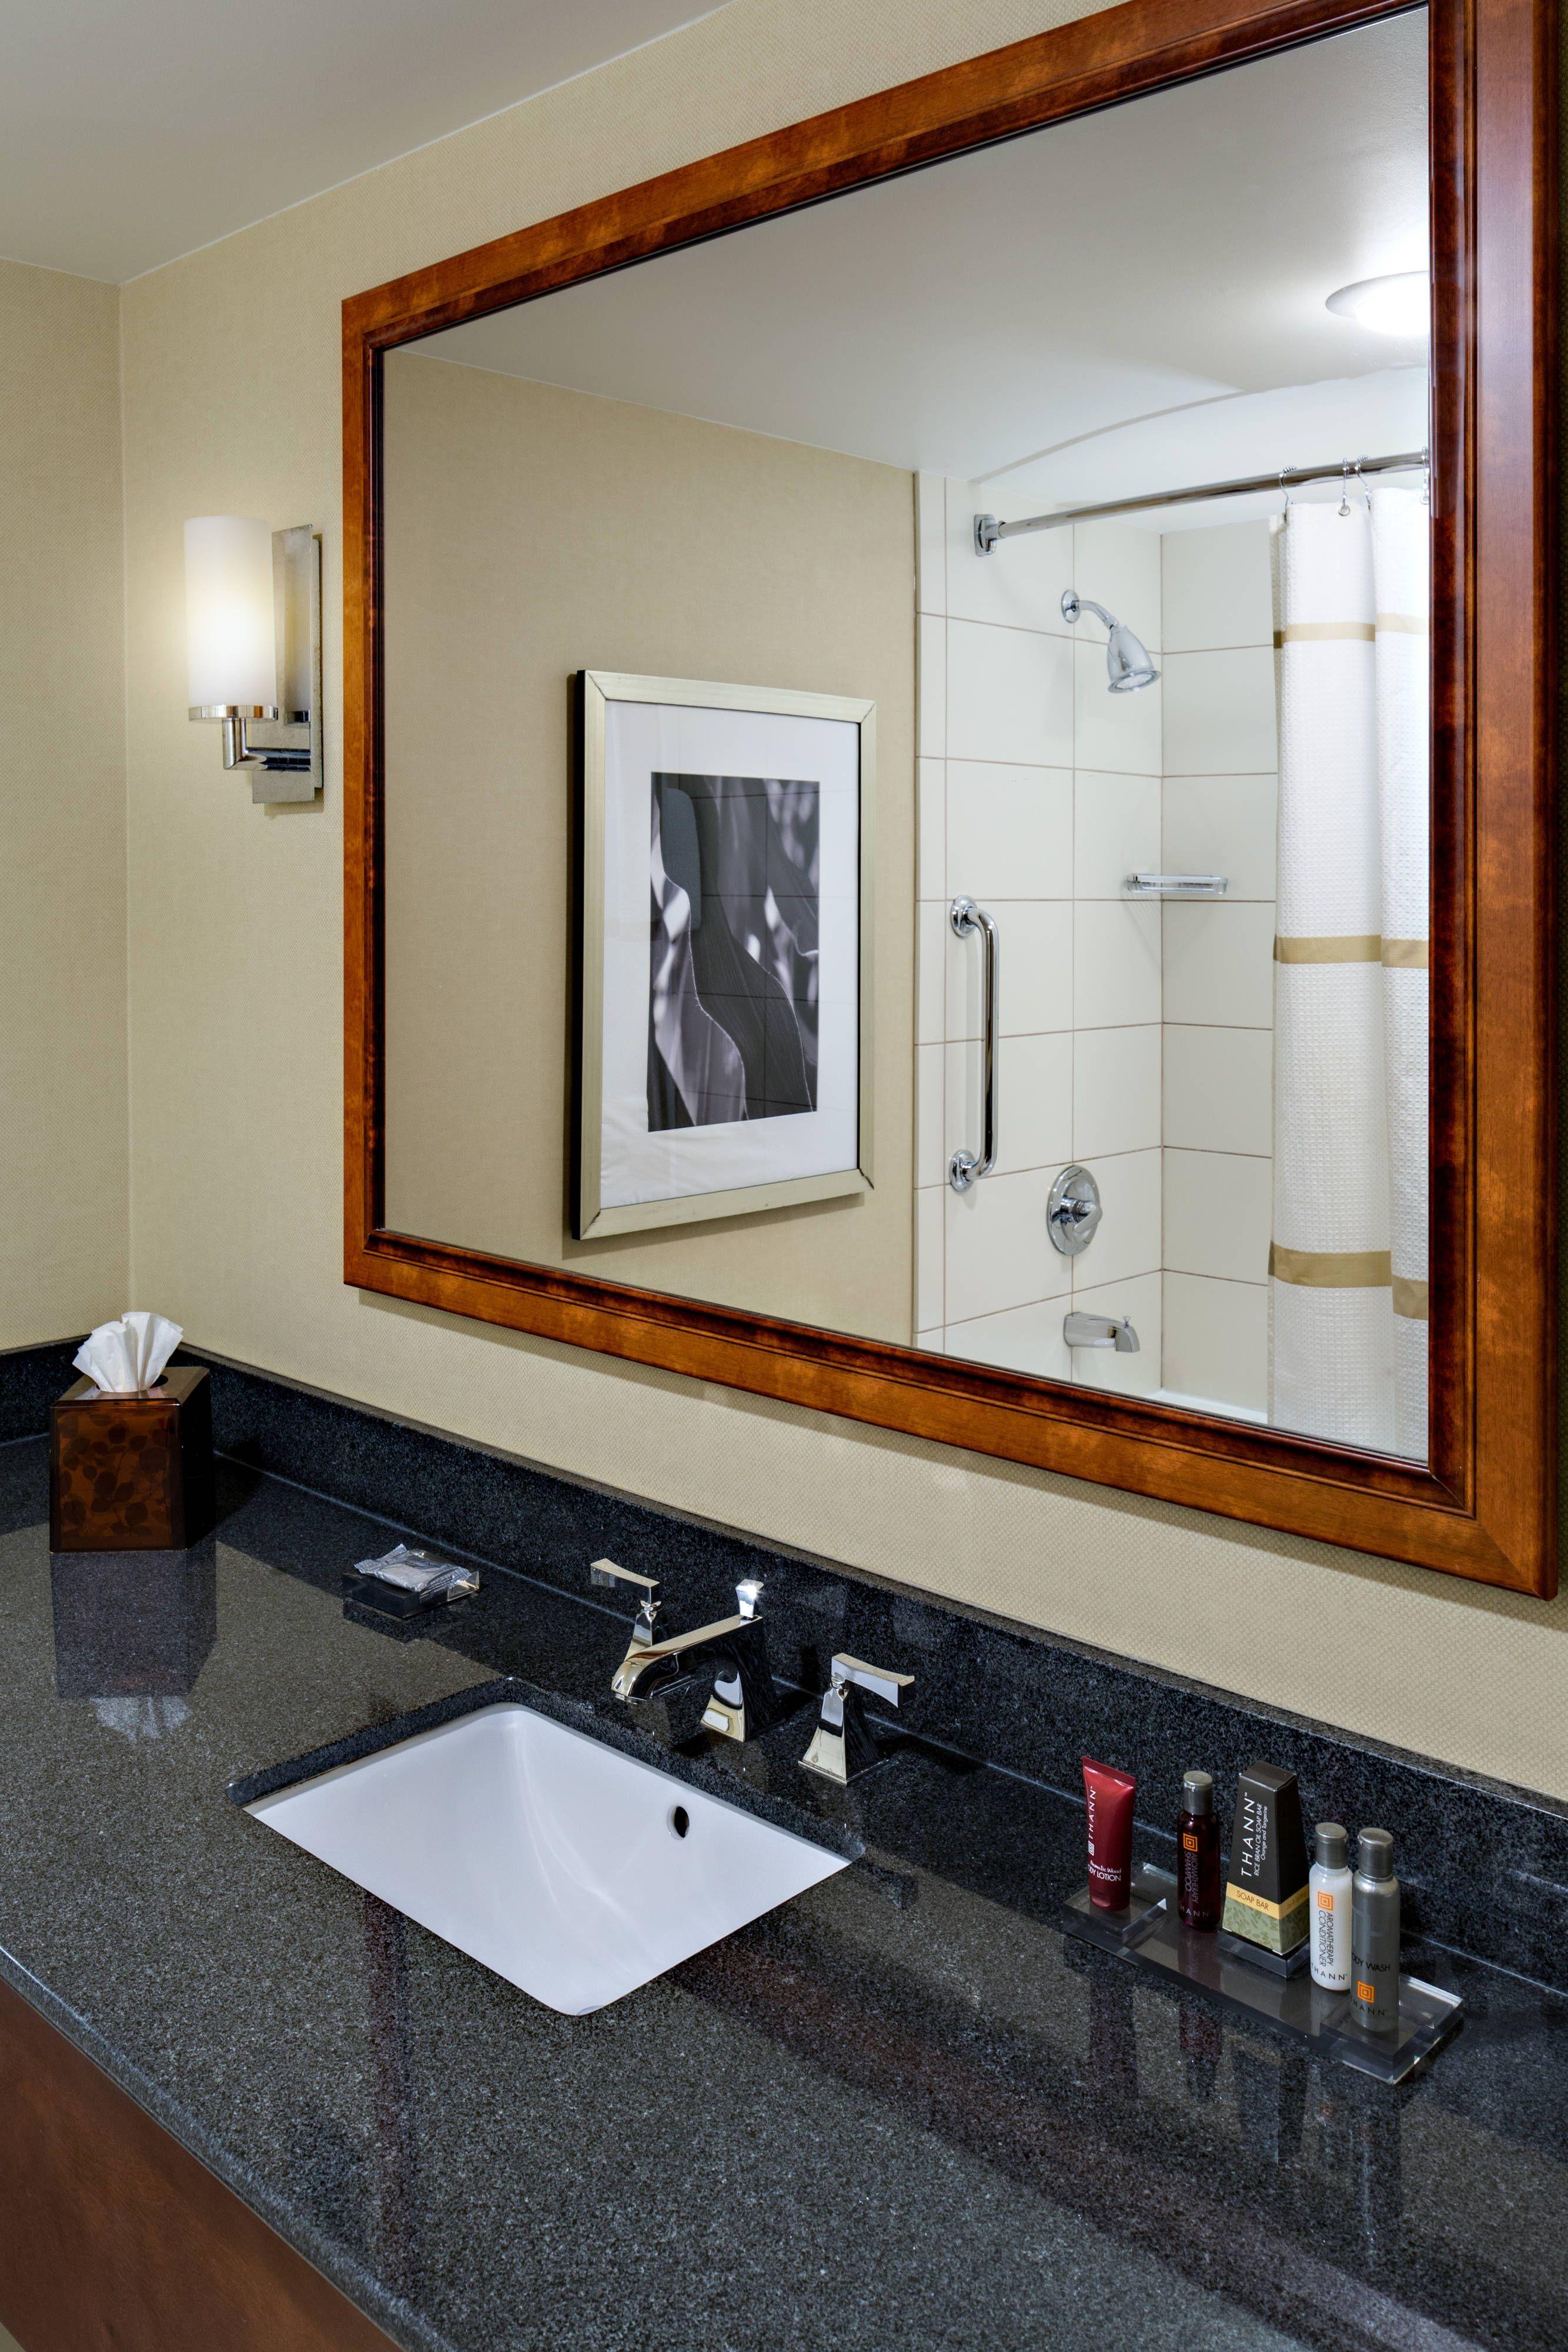 Cedar rapids marriott bathroom happy hotel guestroom